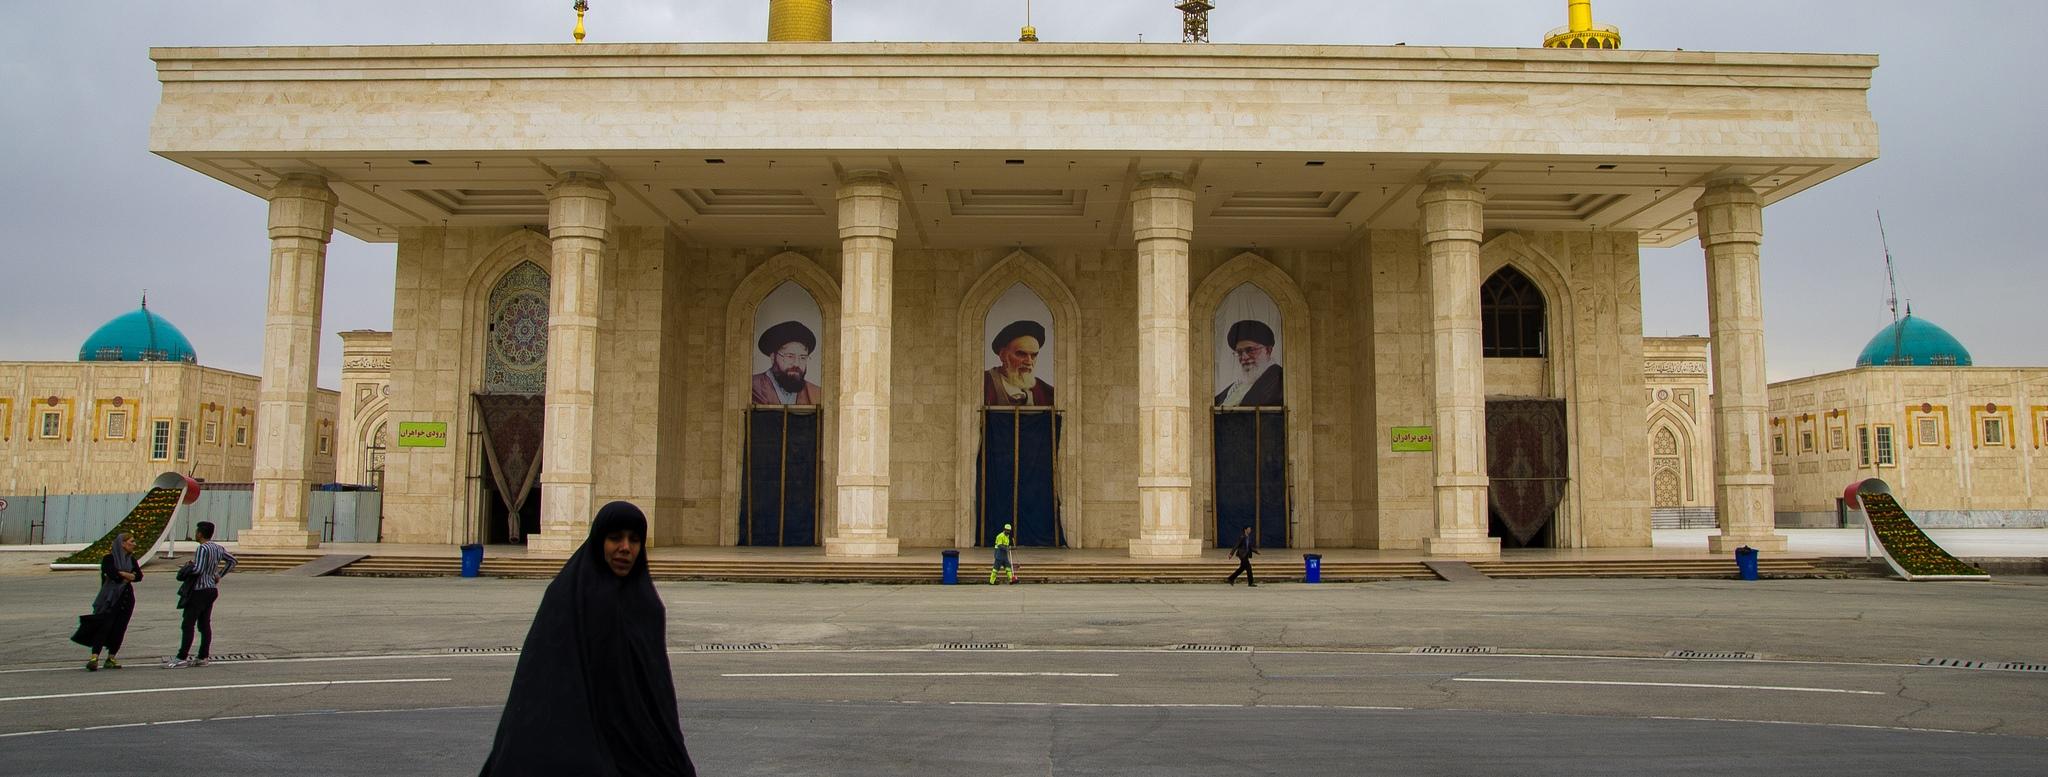 The entrance of the mausoleum of Ayatollah Khomeini, founder of the Islamic Republic of Iran. (Flickr/Gilbert Sopakuwa)